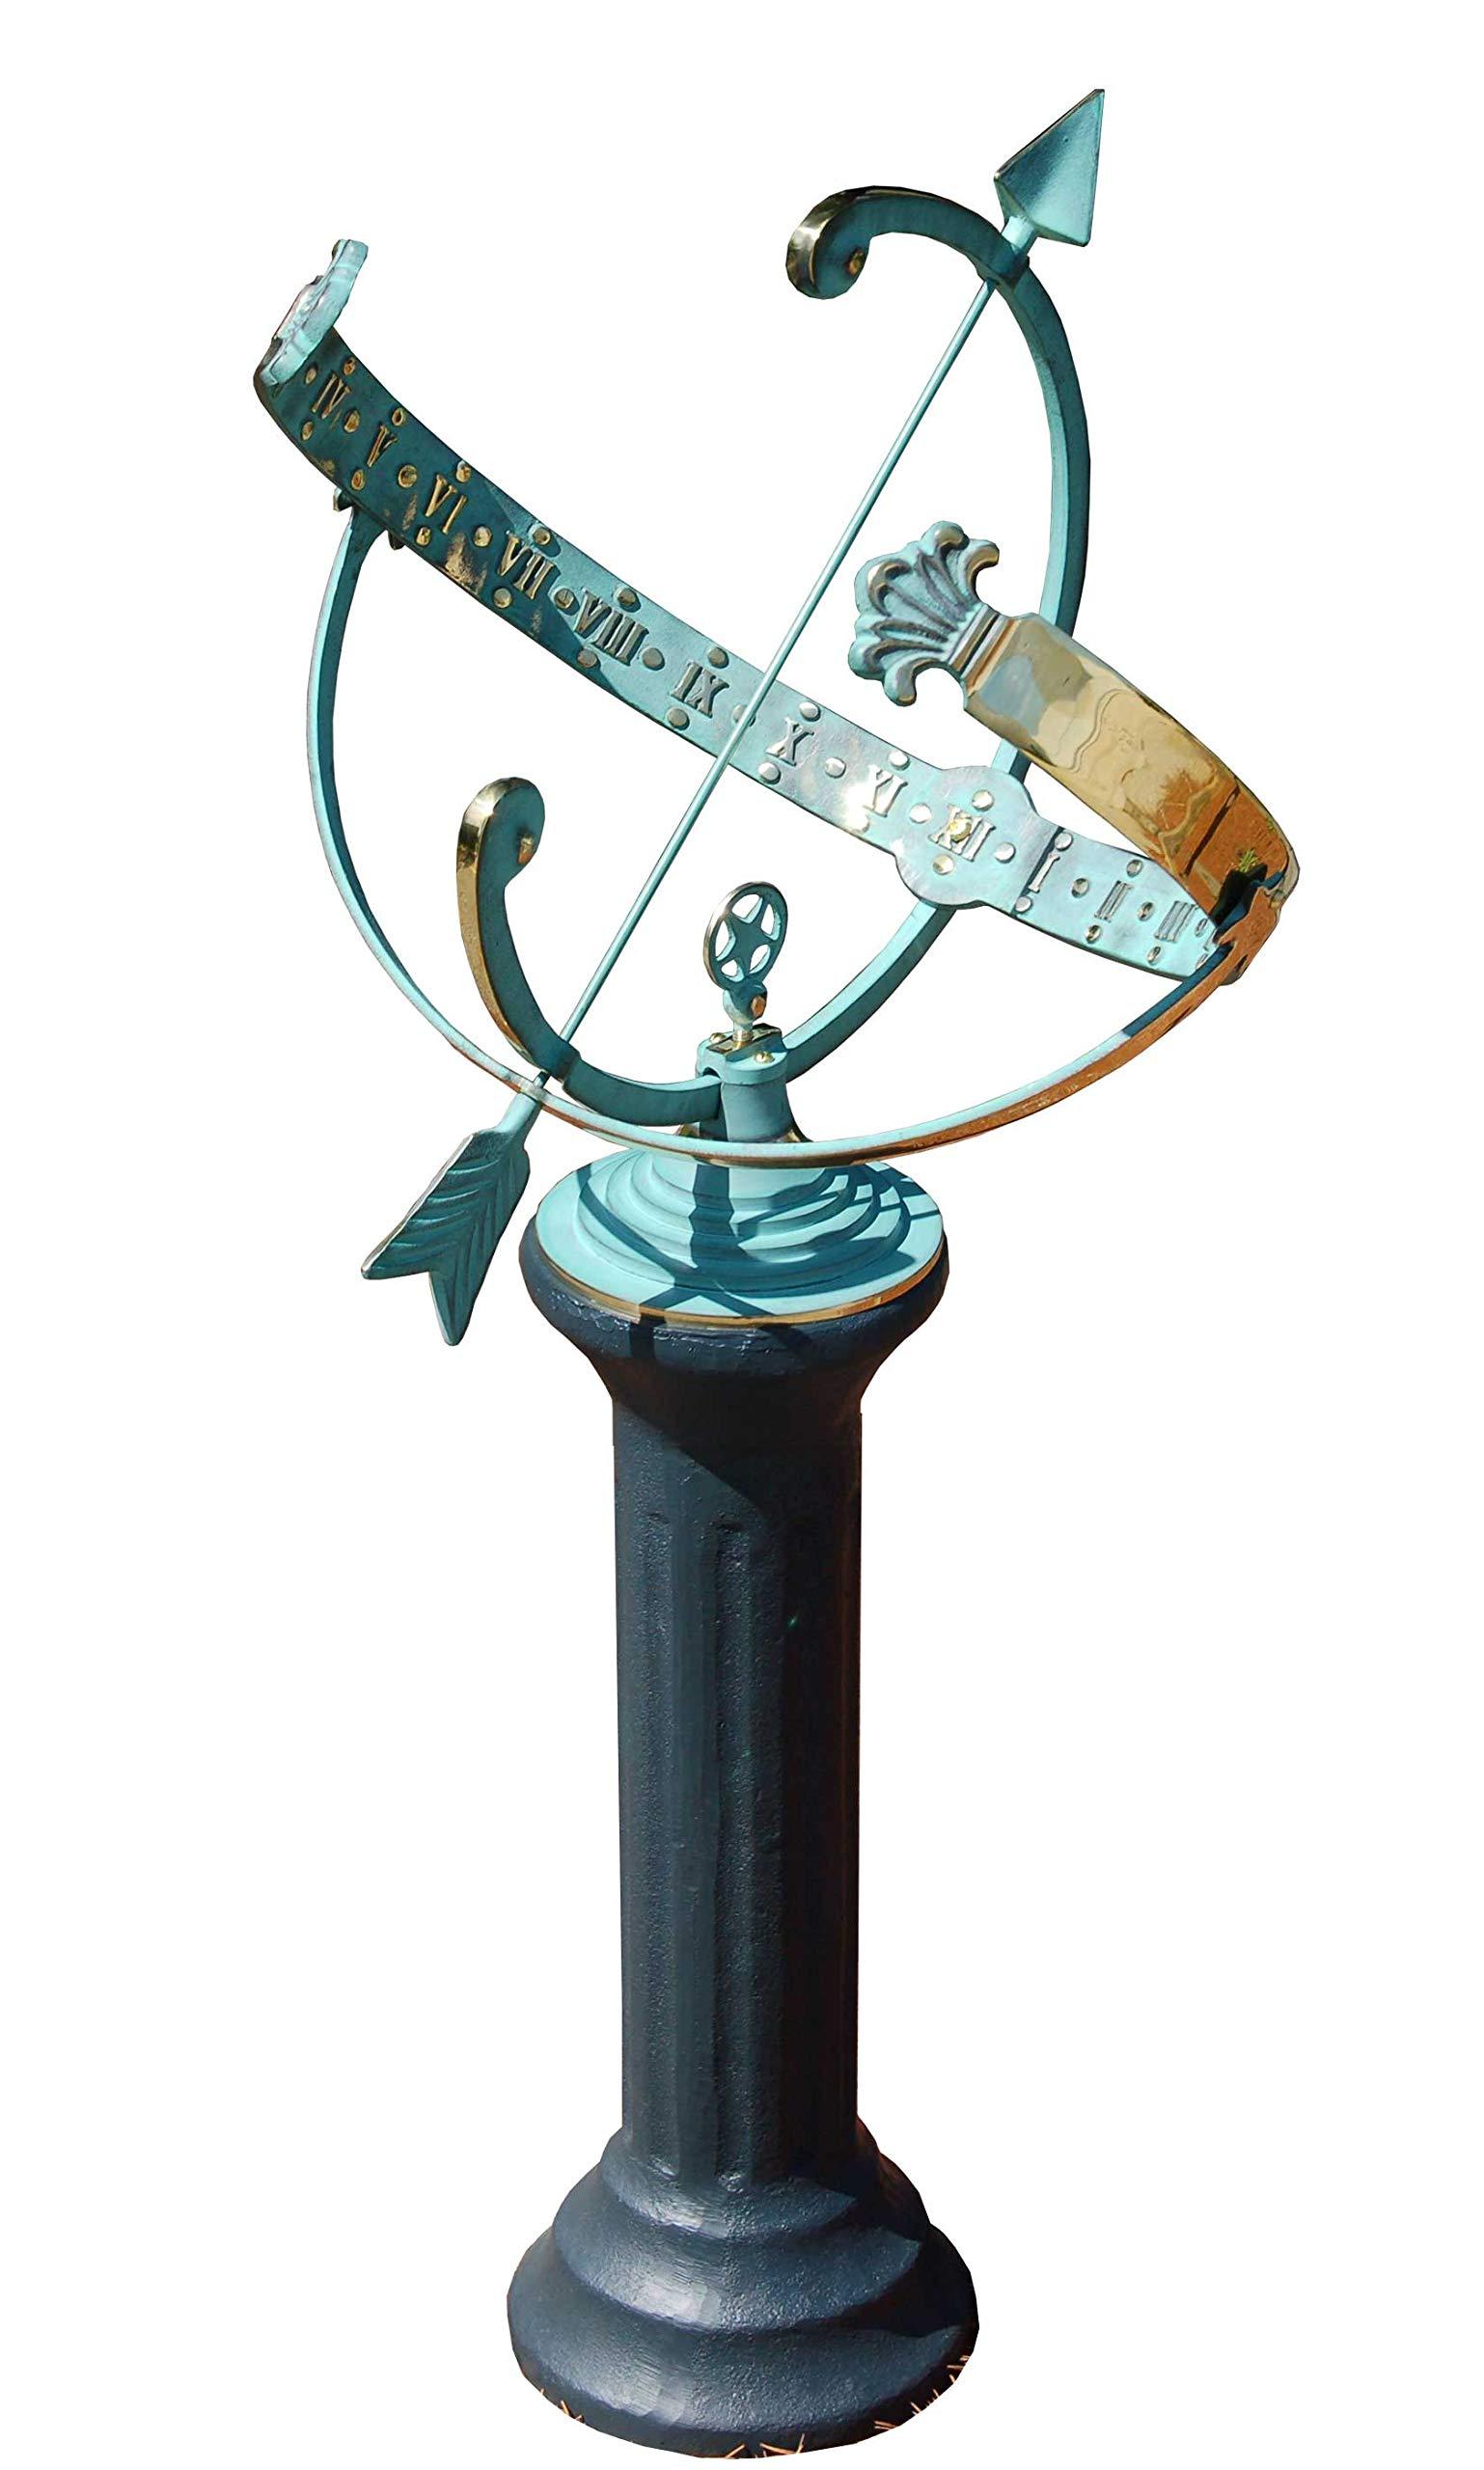 BestNest Rome Star Armillary Sundial and Roman Pedestal by BestNest